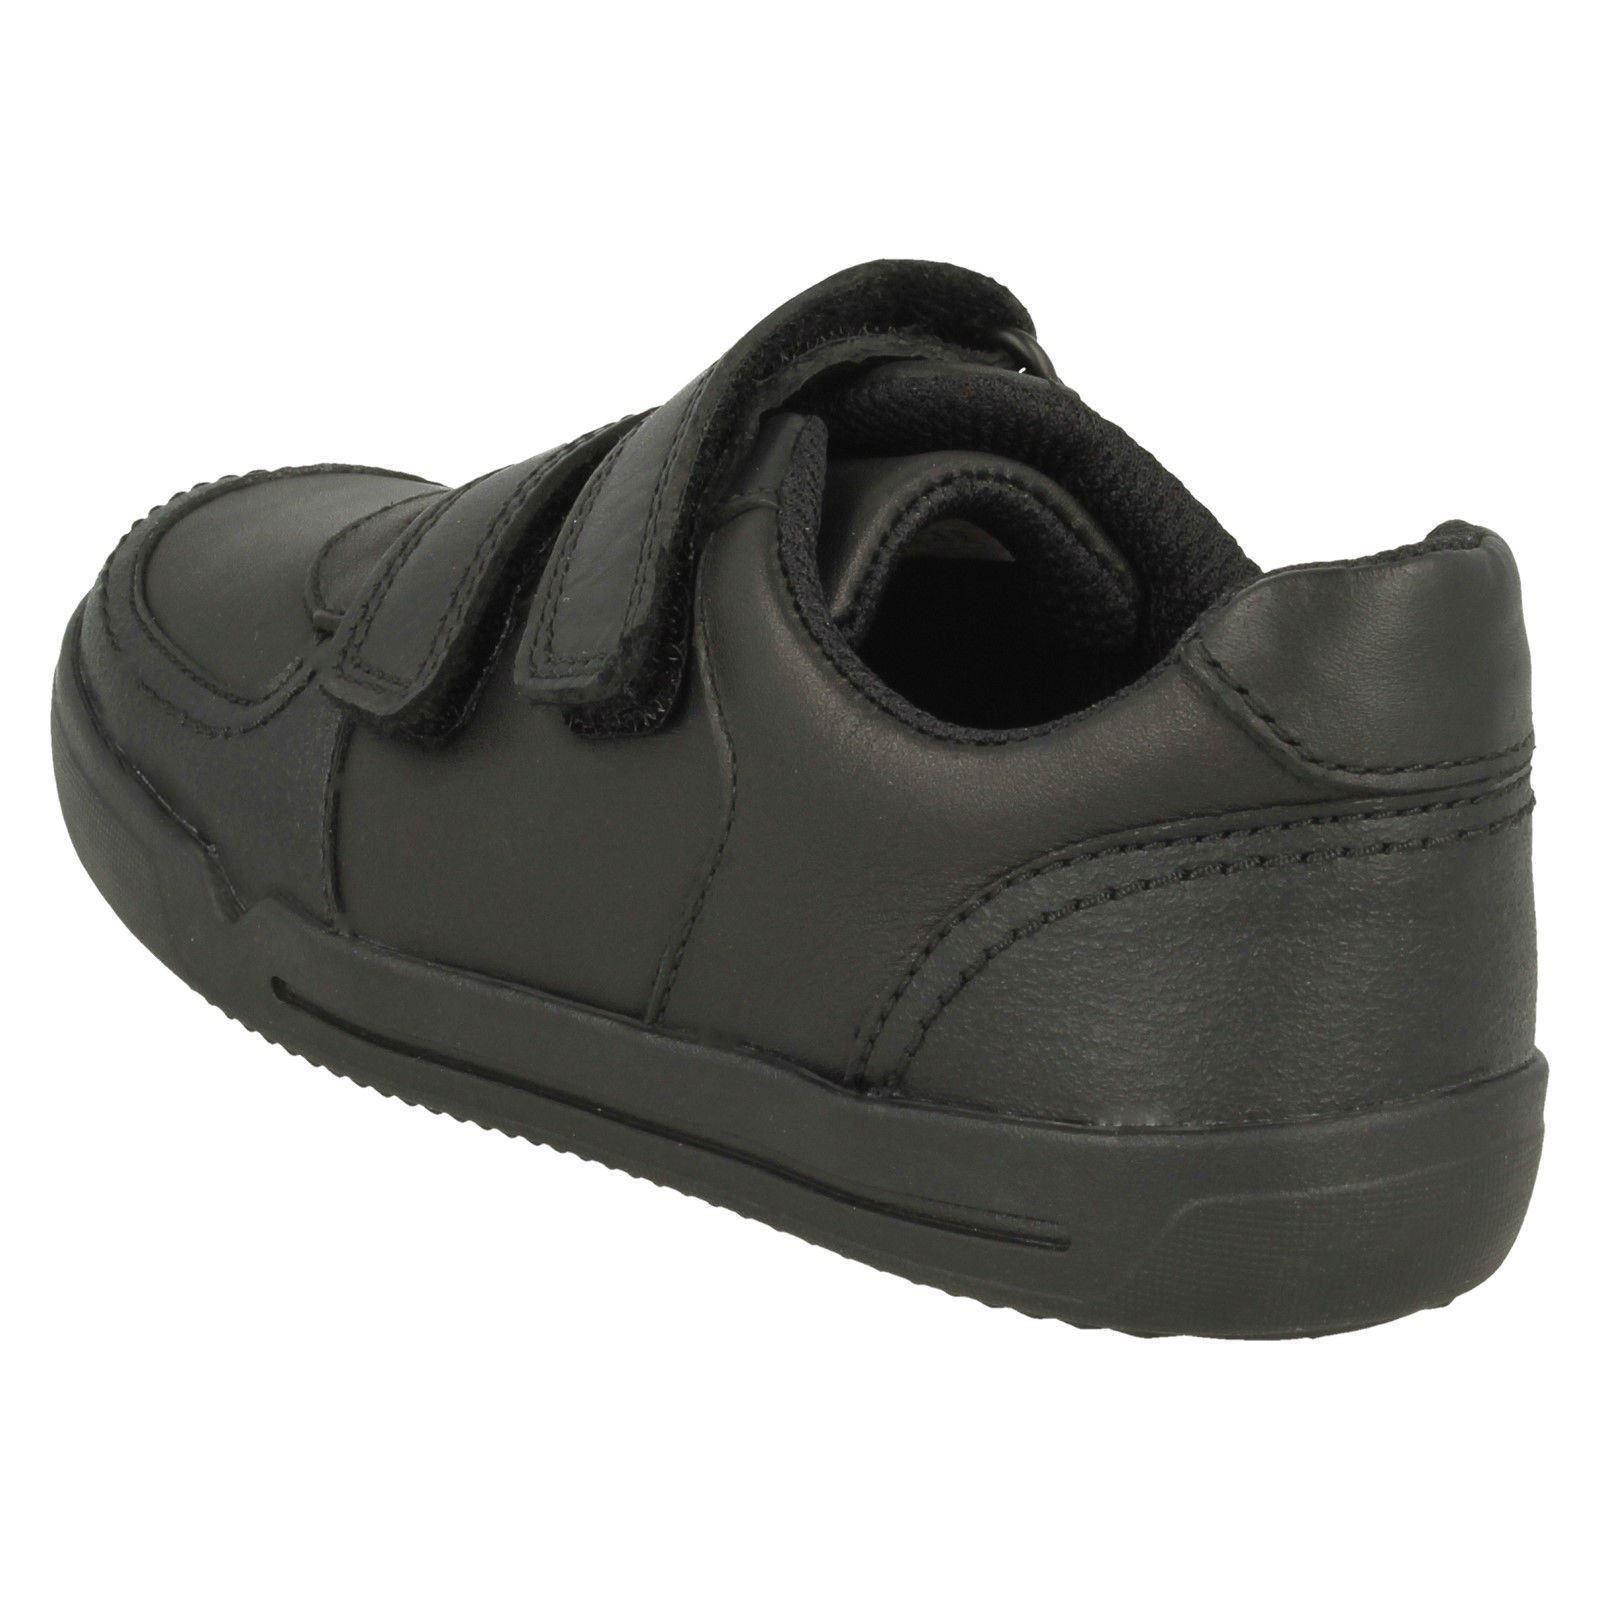 Clarks Boys Hook /& Loop School Shoes Mini Racer